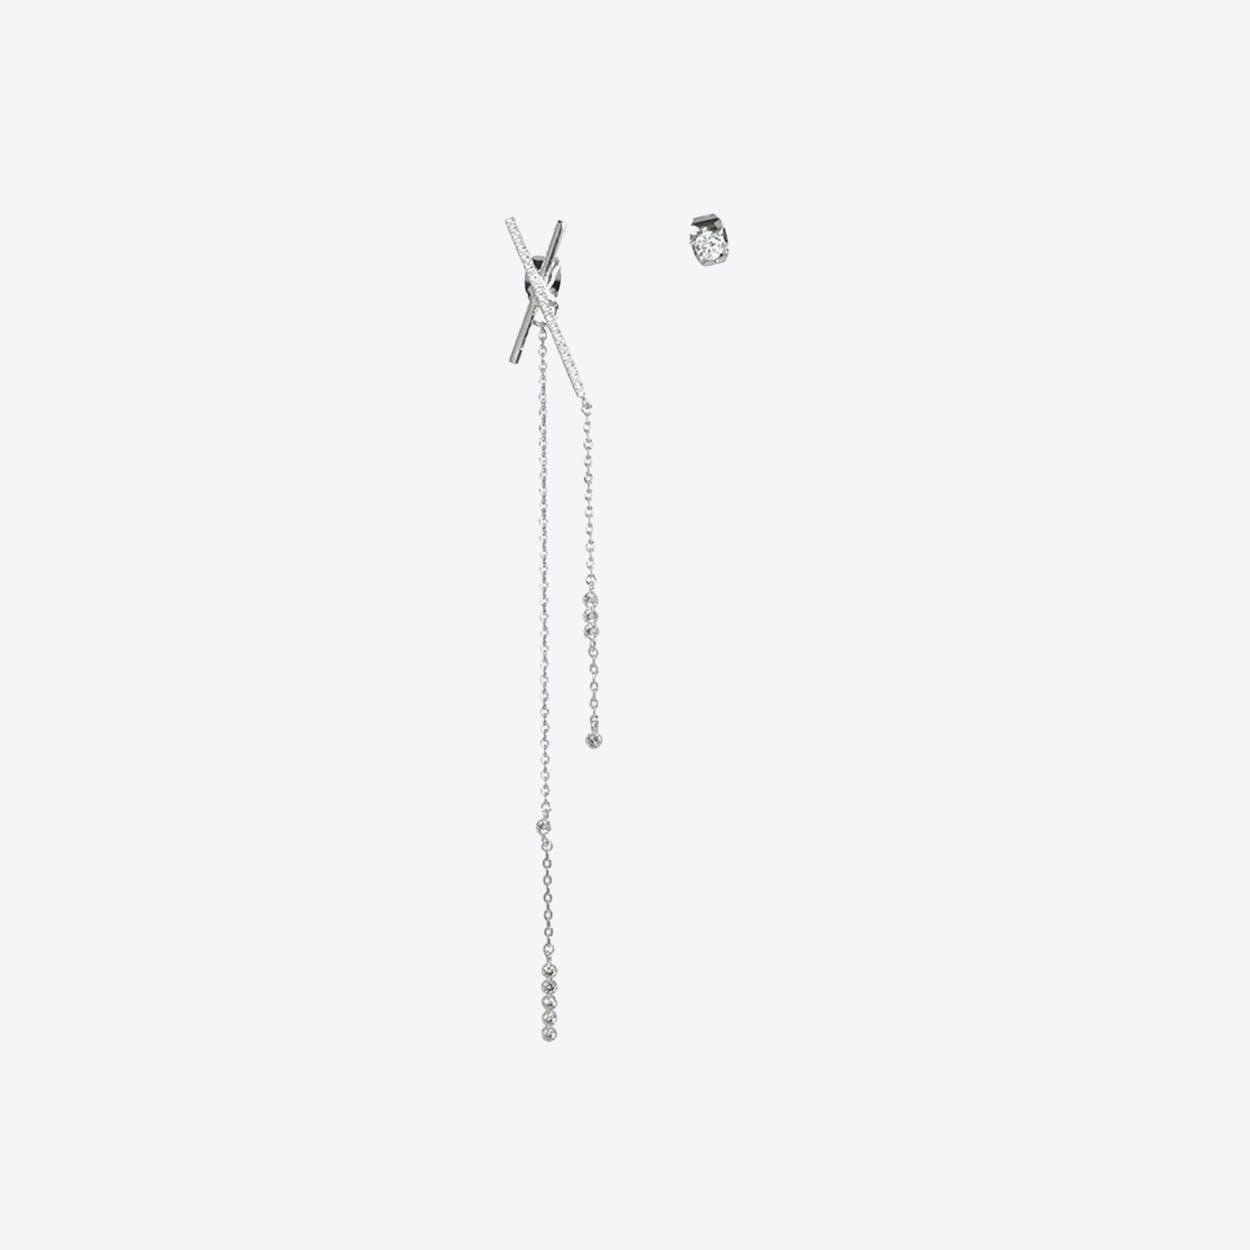 White Gold Asymmetric Statement Bar Earrings